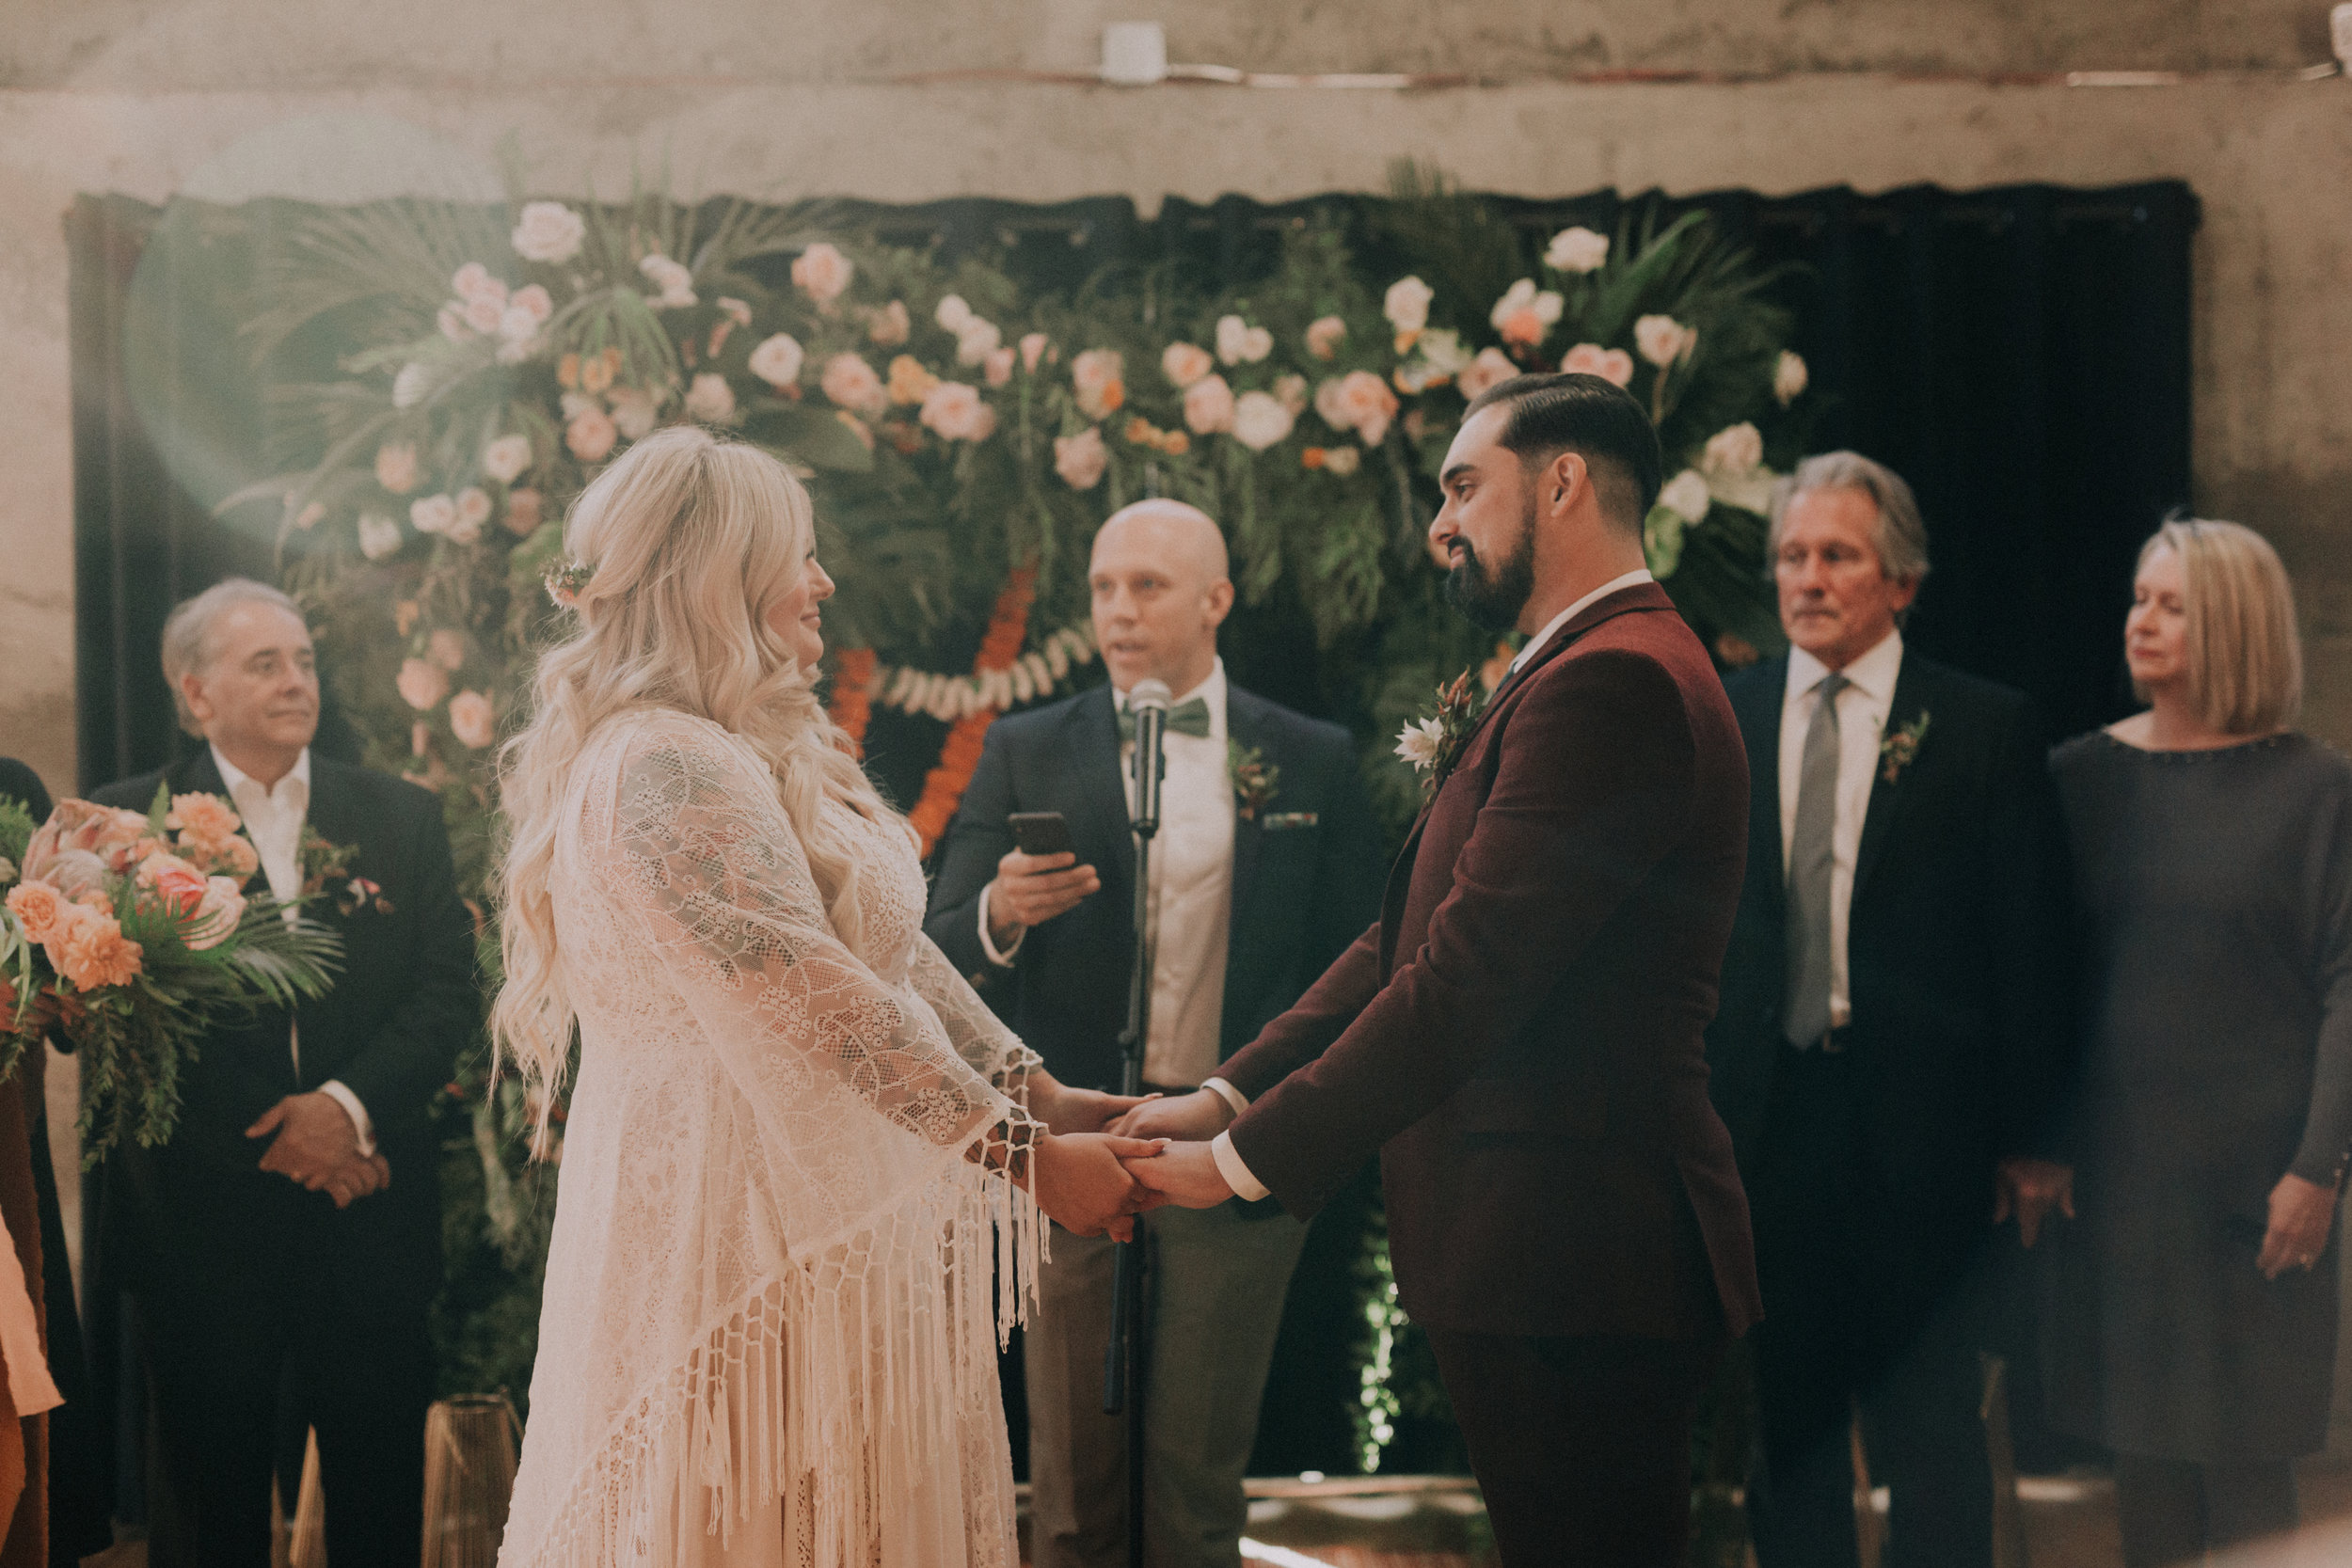 plaza del torro wedding